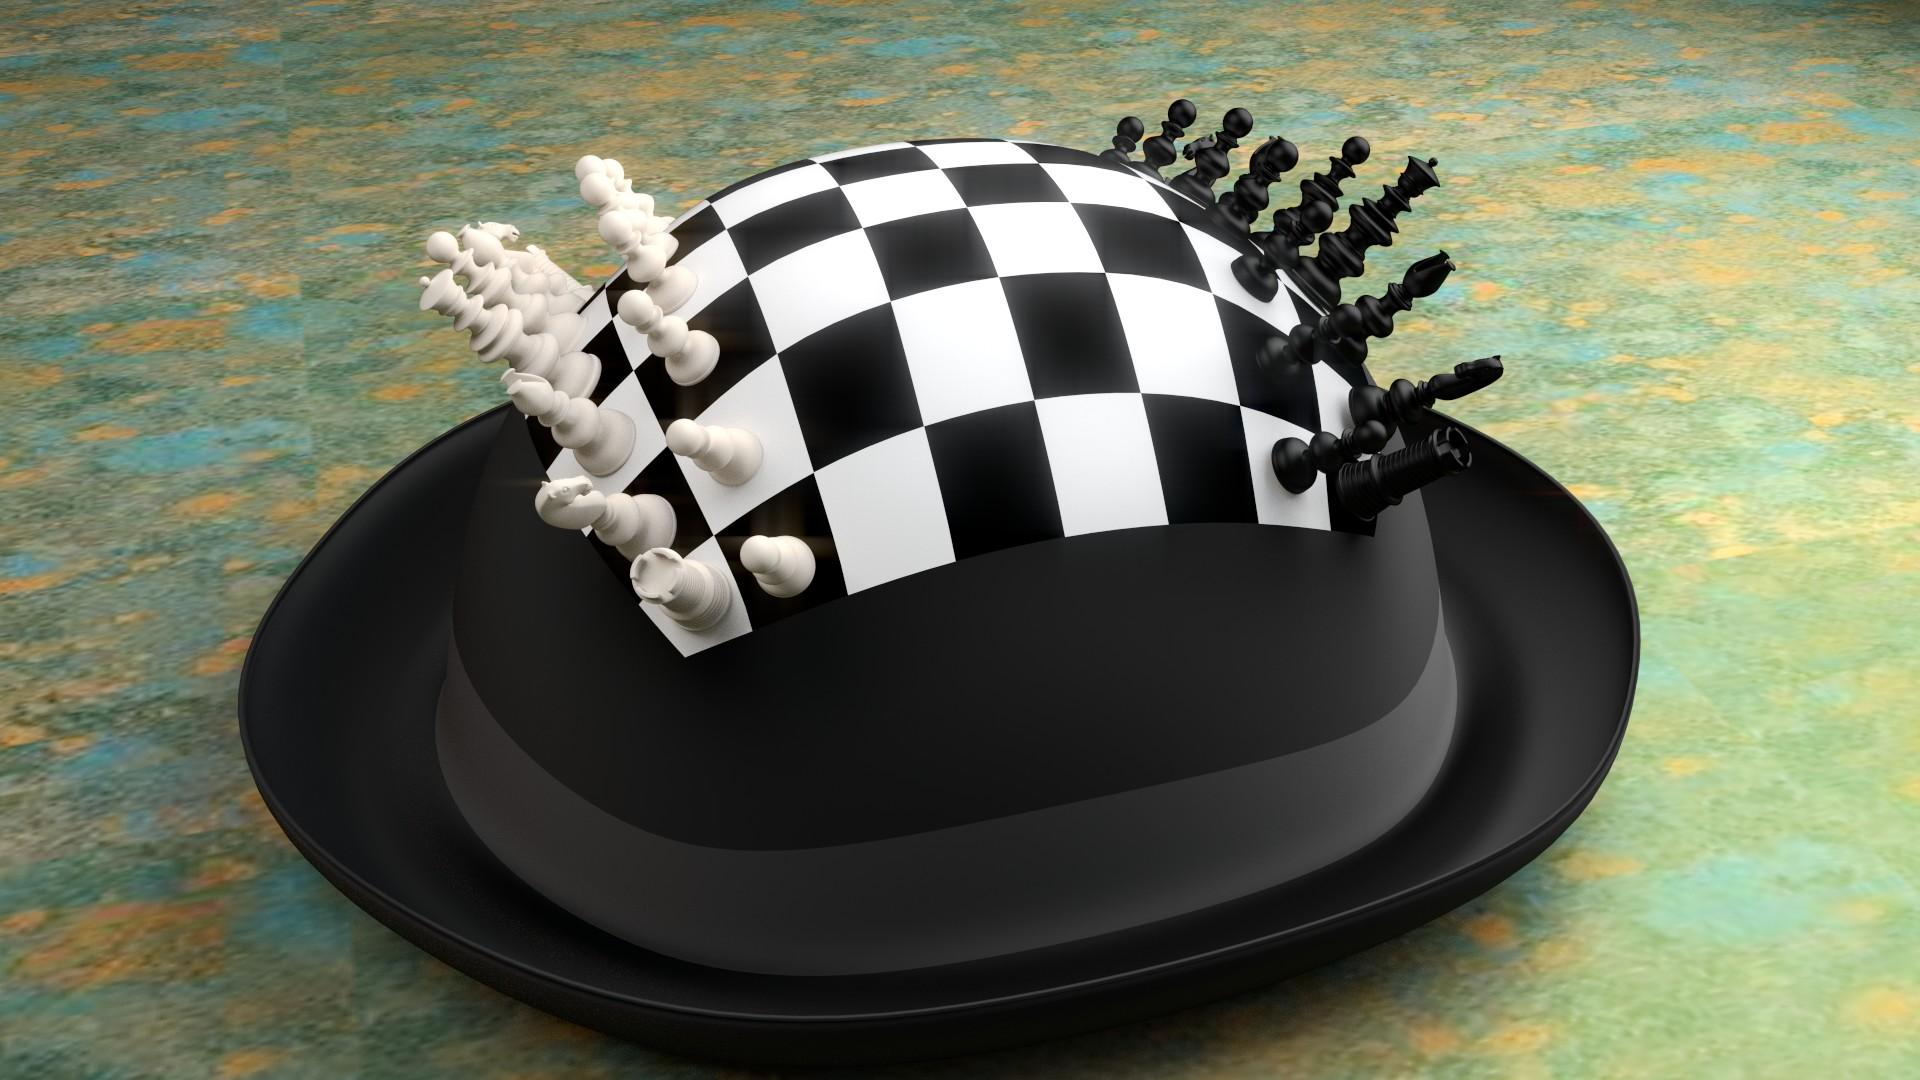 Sombrero_Ajedrez-sombrero_ajedrez_nodos.jpg